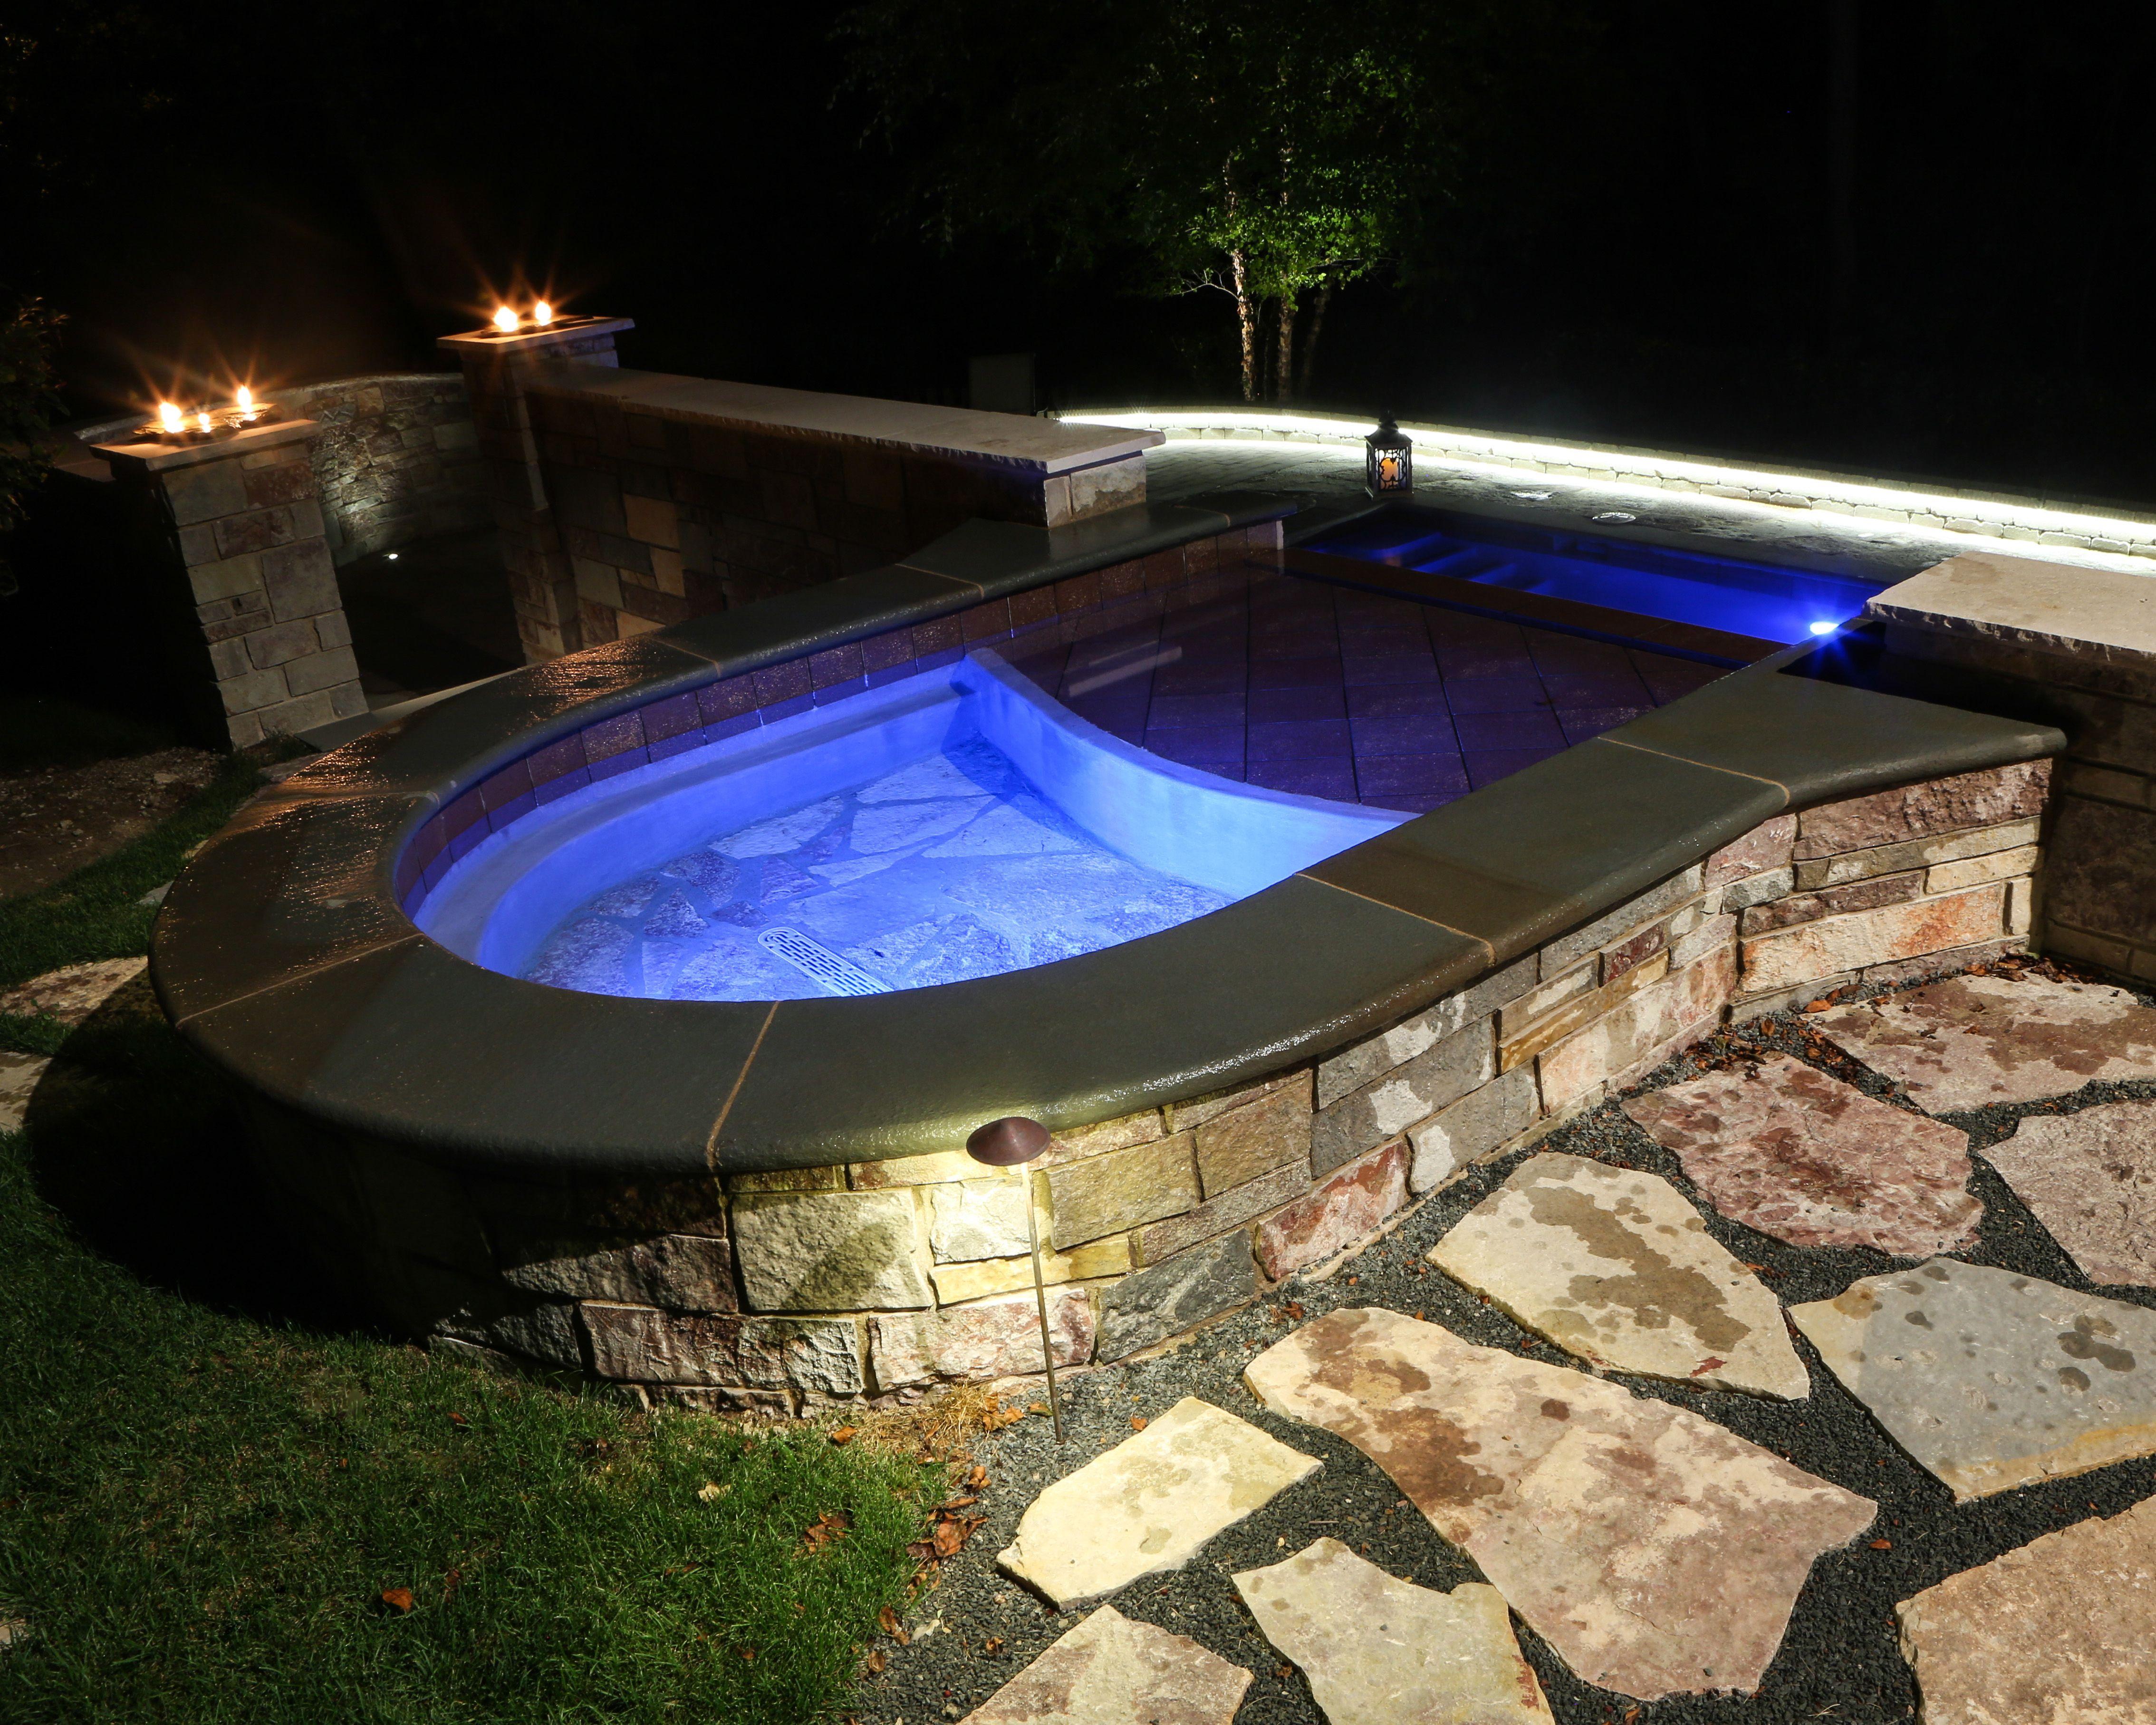 Grayslake, IL - custom pool and spa - Quantus Pools  quantuspools.com 847-907-4995